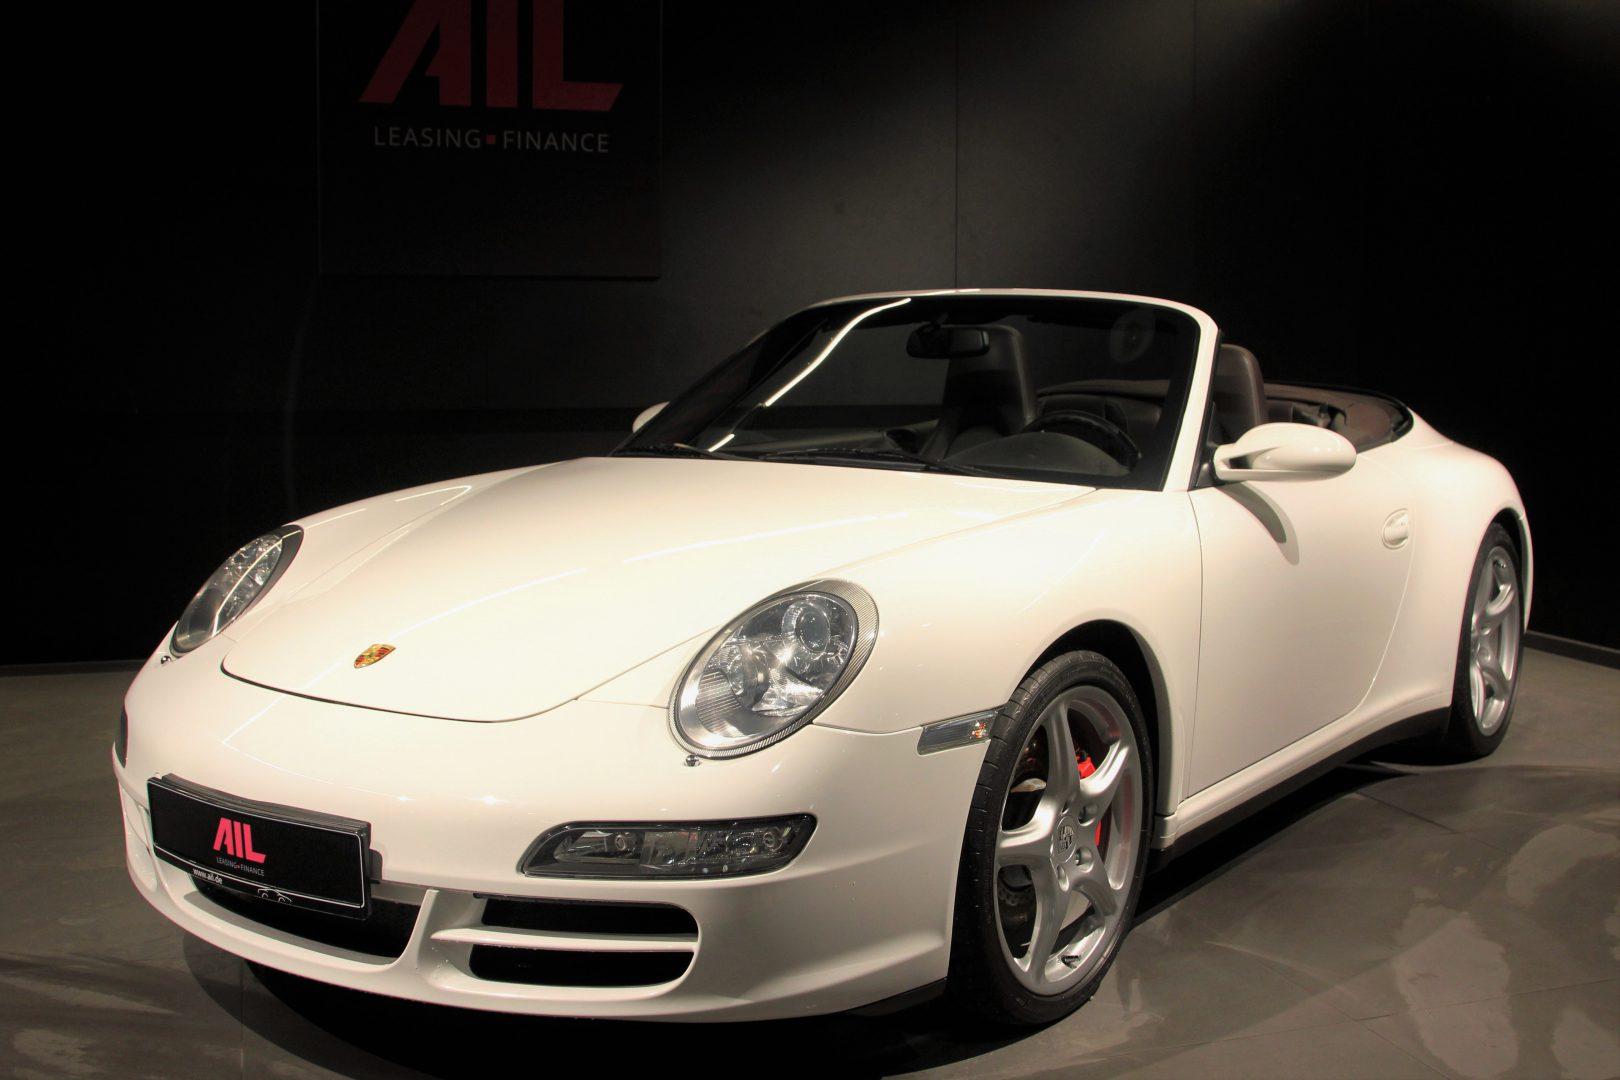 AIL Porsche 911 997 4S Cabrio Sport-Chrono-Paket Plus 11